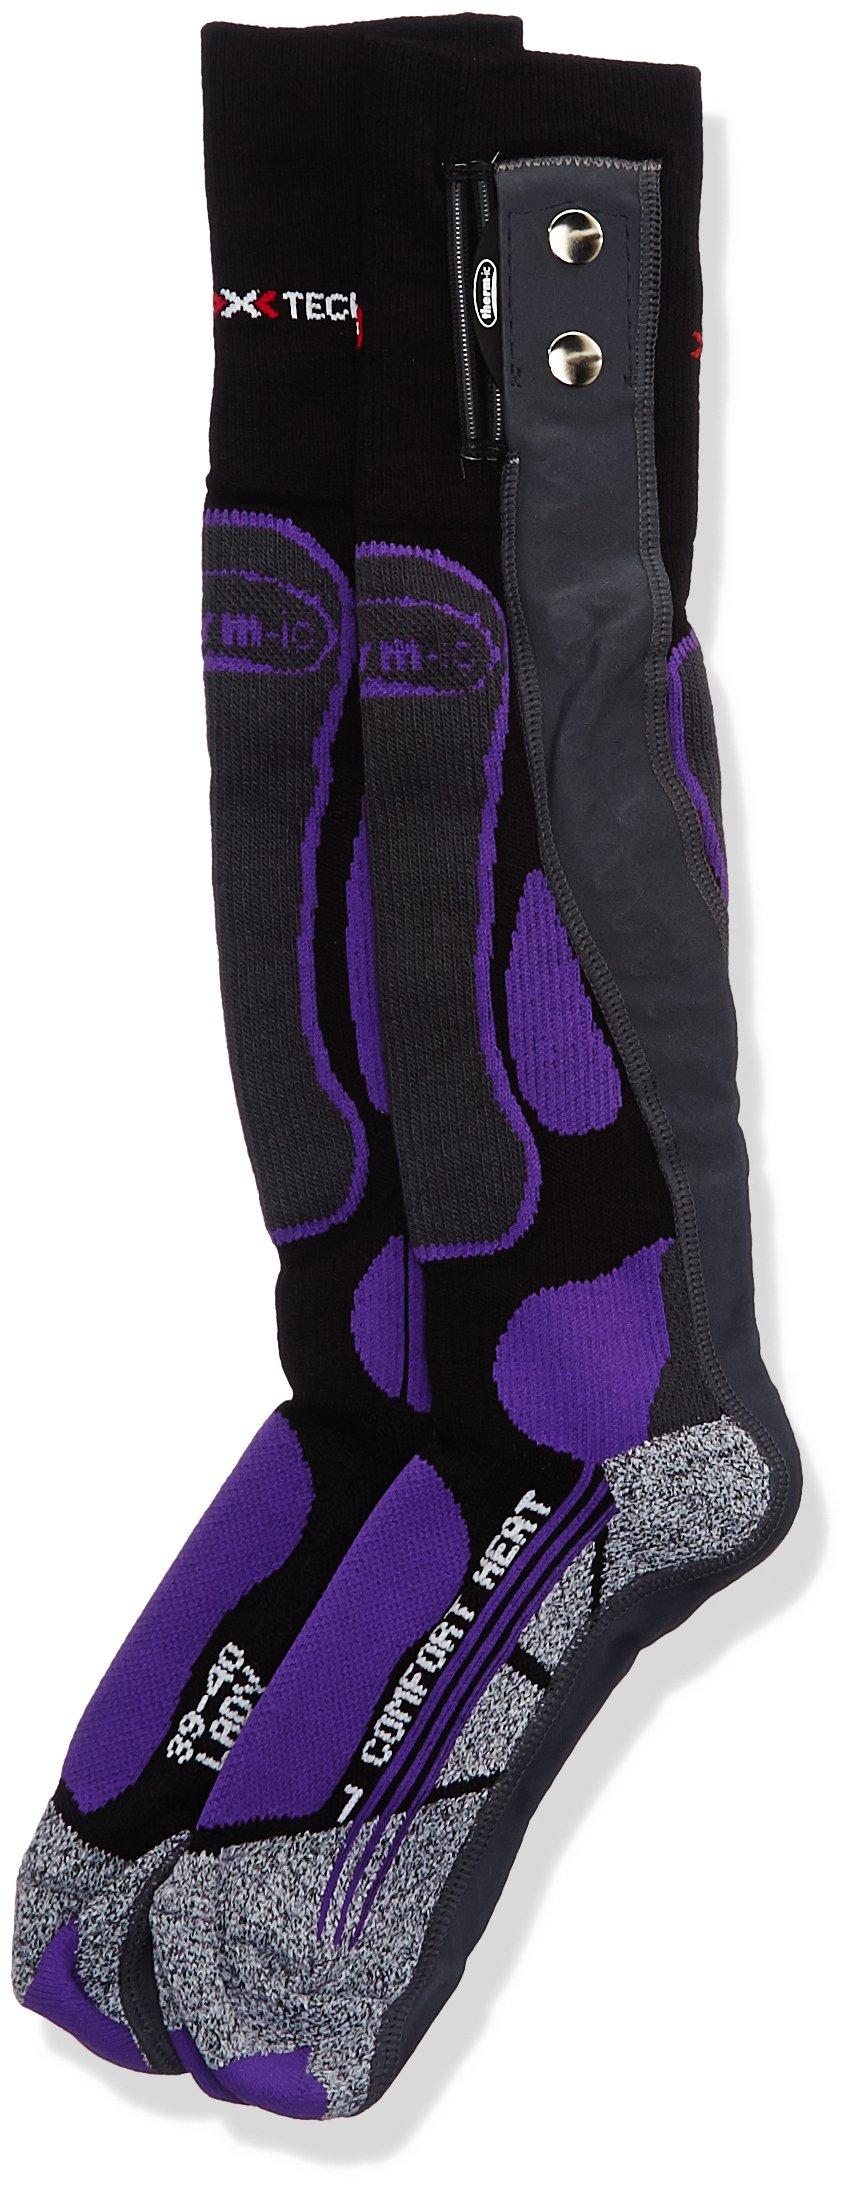 Therm-ic Damen Warme Füße Powersocks Comfort Heat Ladies 1 Pair, Purple/Black/